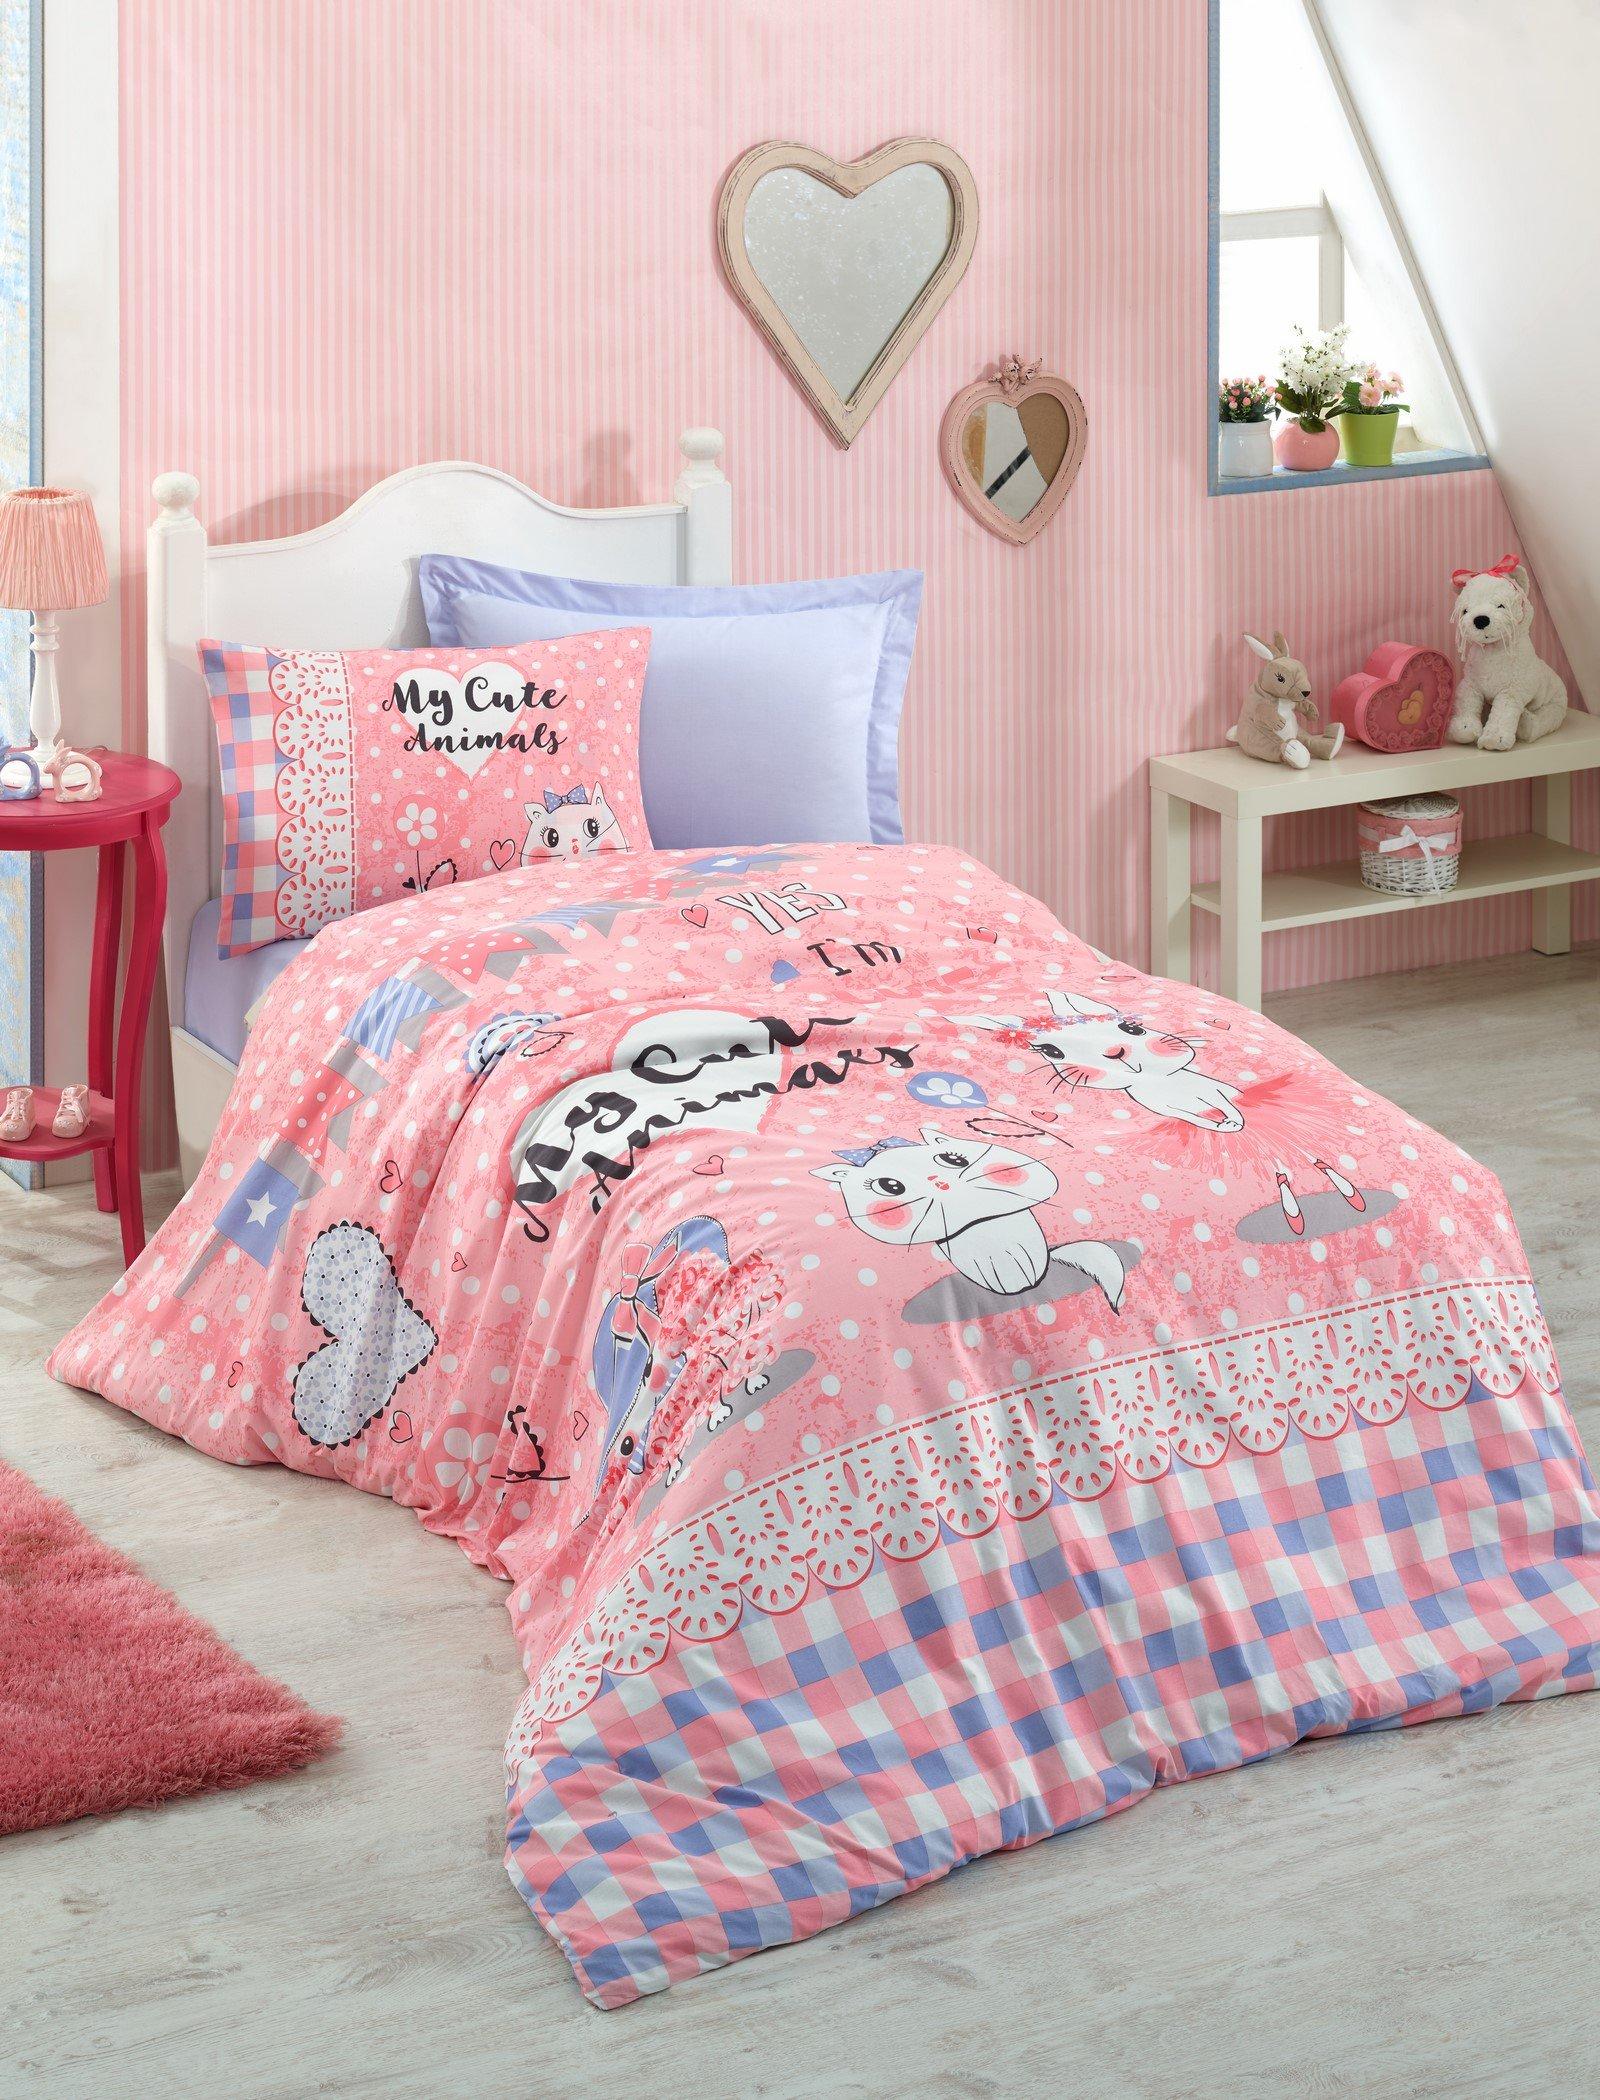 DecoMood 100% Cotton Animals Bedding, Heart Cats Kitty Kitten Themed Single/Twin Size Duvet Cover Set, Pink (3 Pcs)